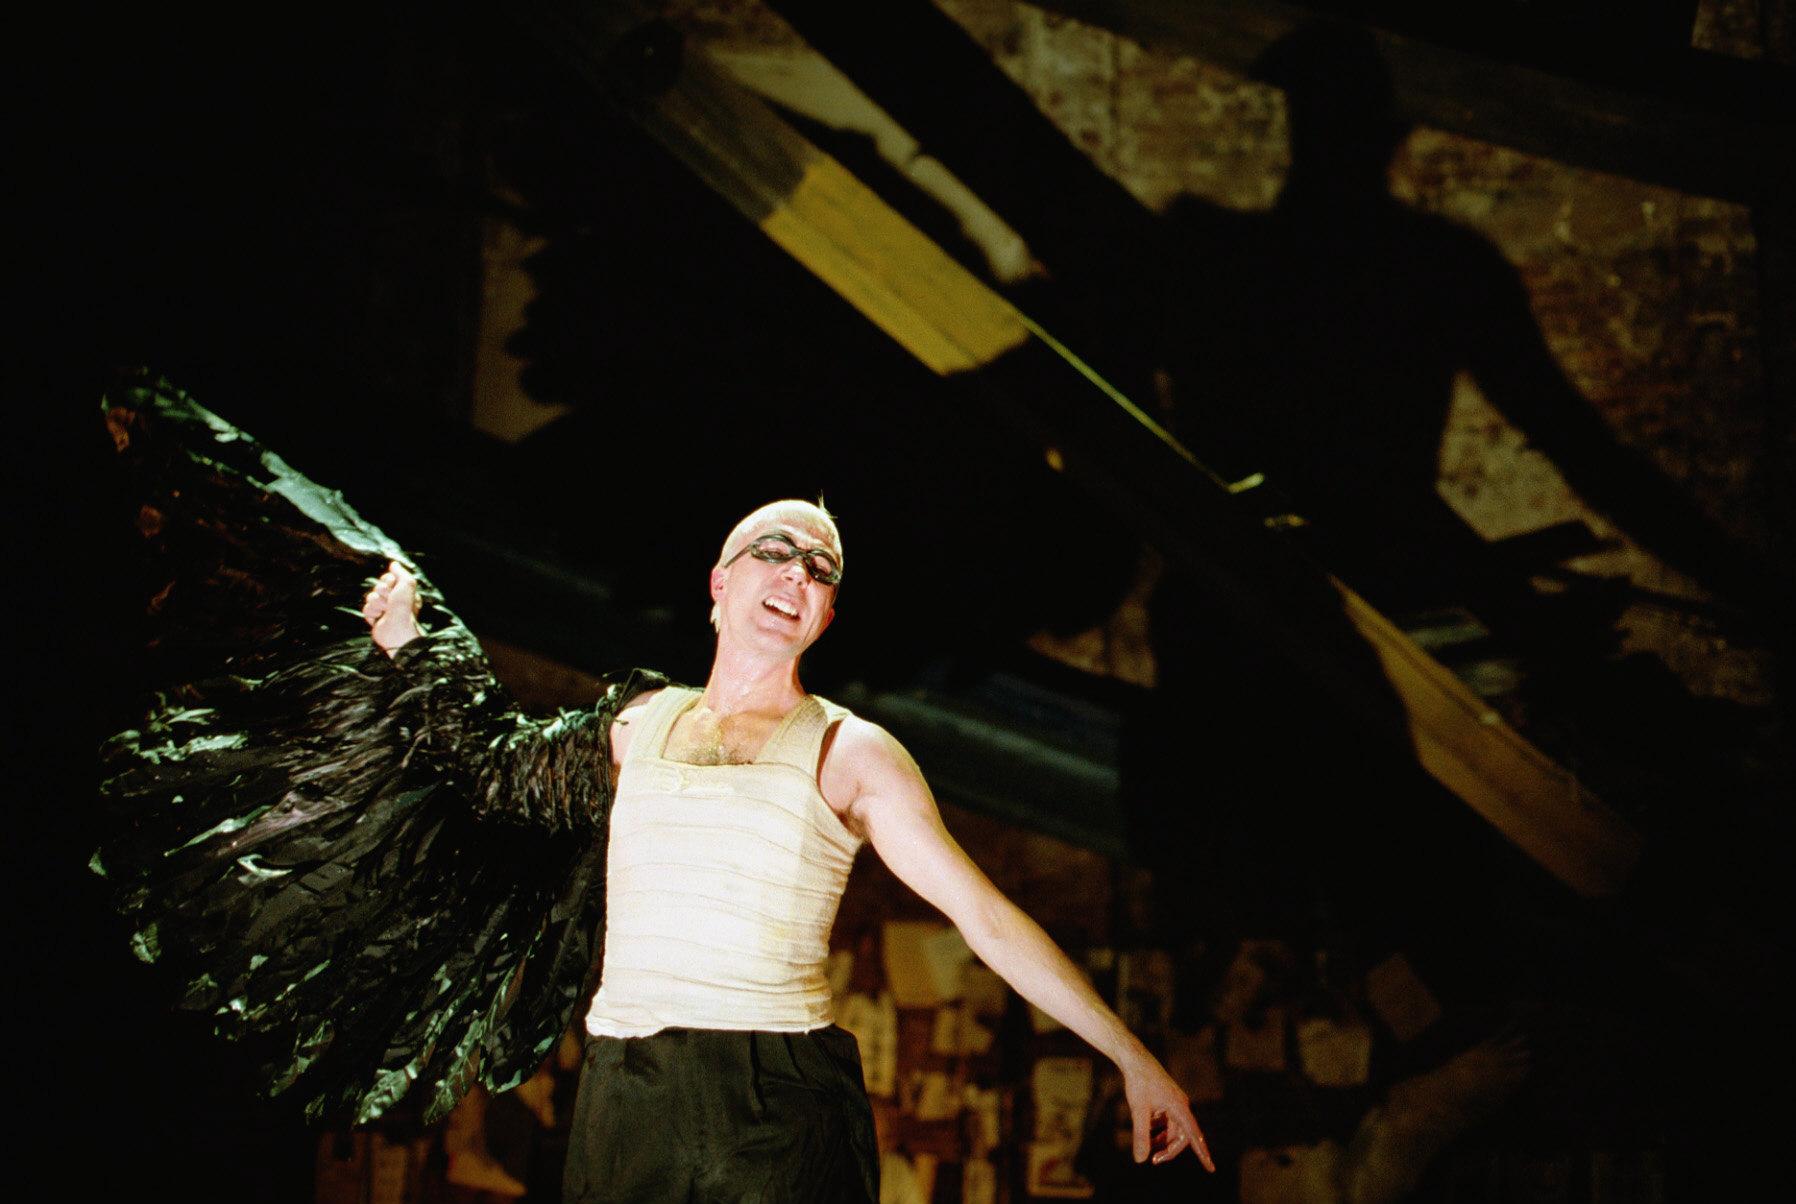 Photograph of Aidan Gillen as Ariel in The Tempest, 2000